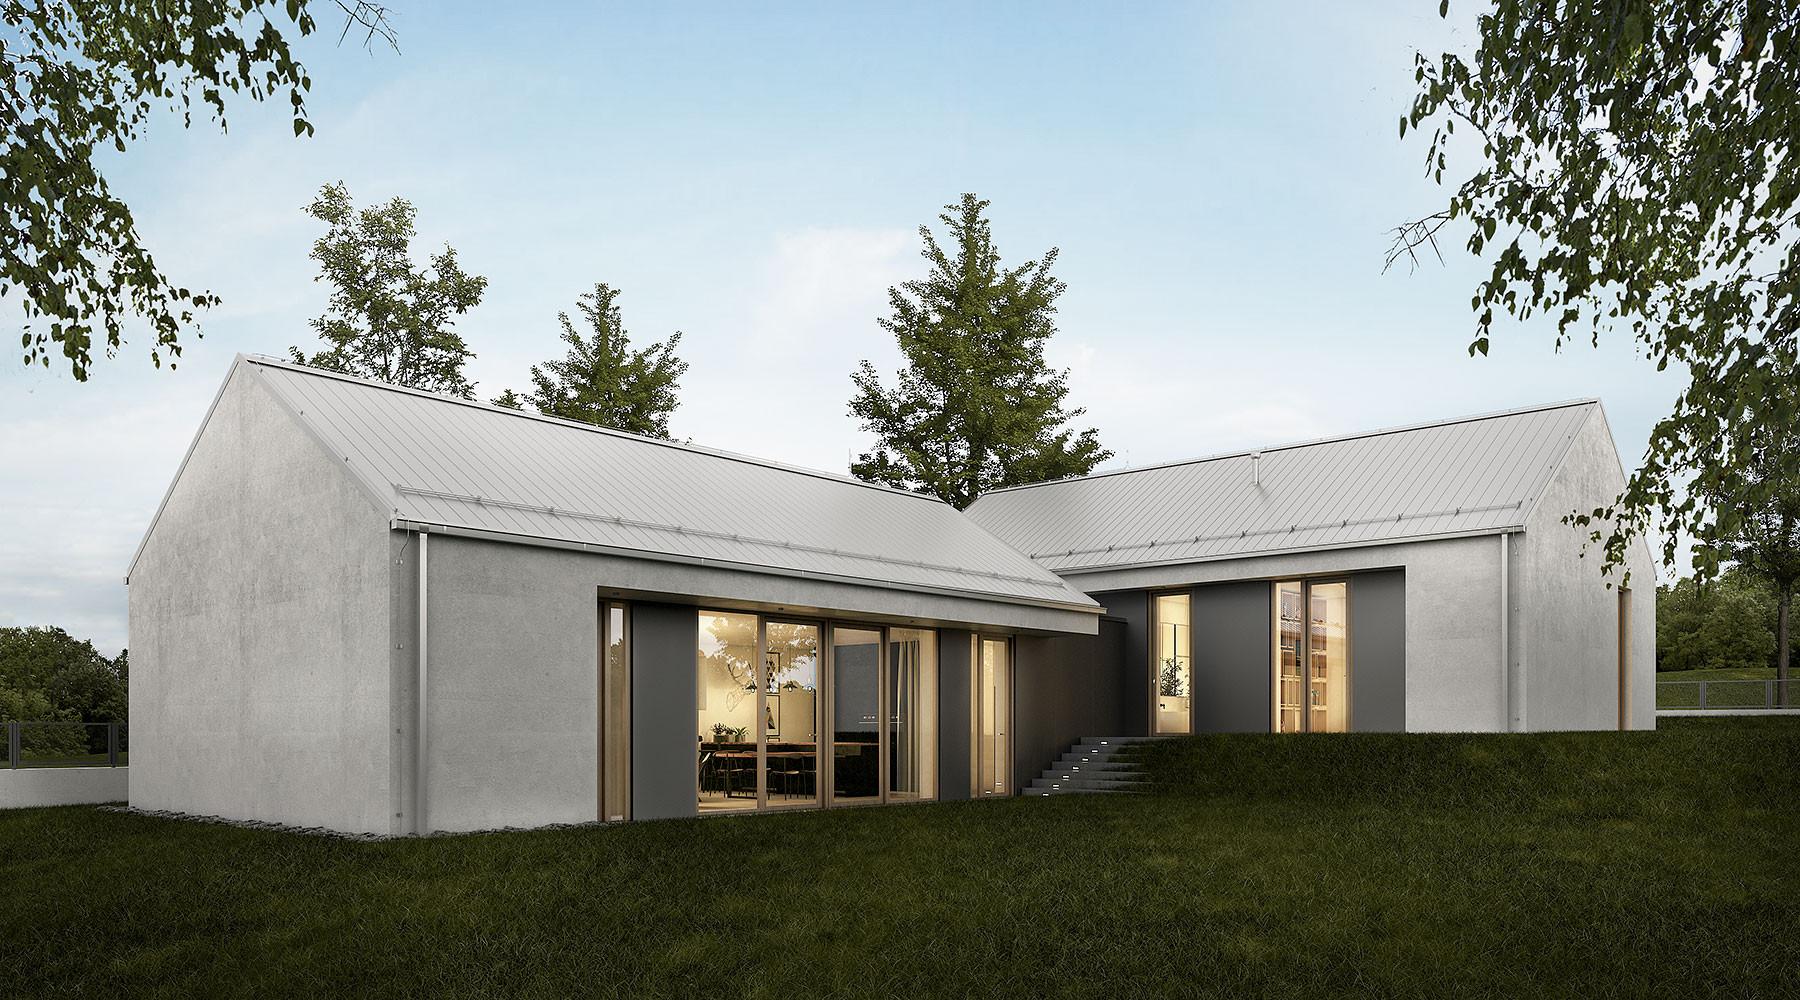 viceurovnova-moderni-vila-se-sikmou-strechou-dream-homes-plavec-perspektiva